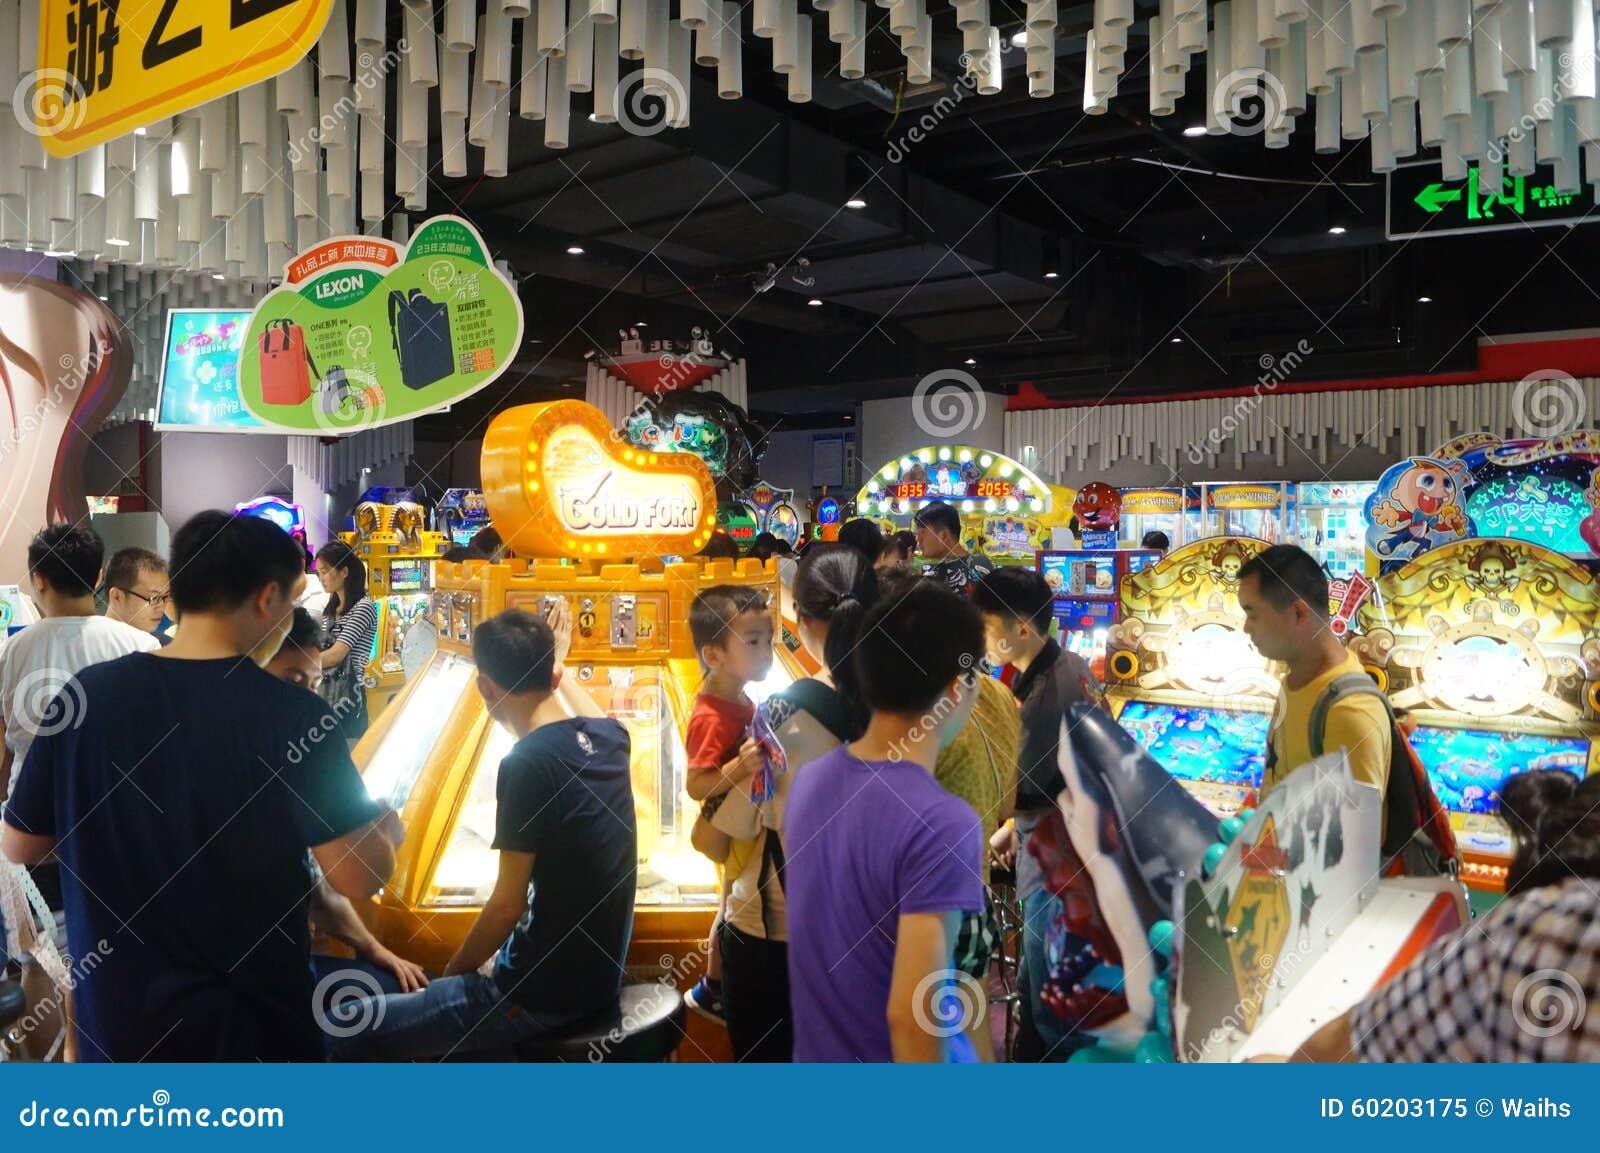 Chinatown Game Room